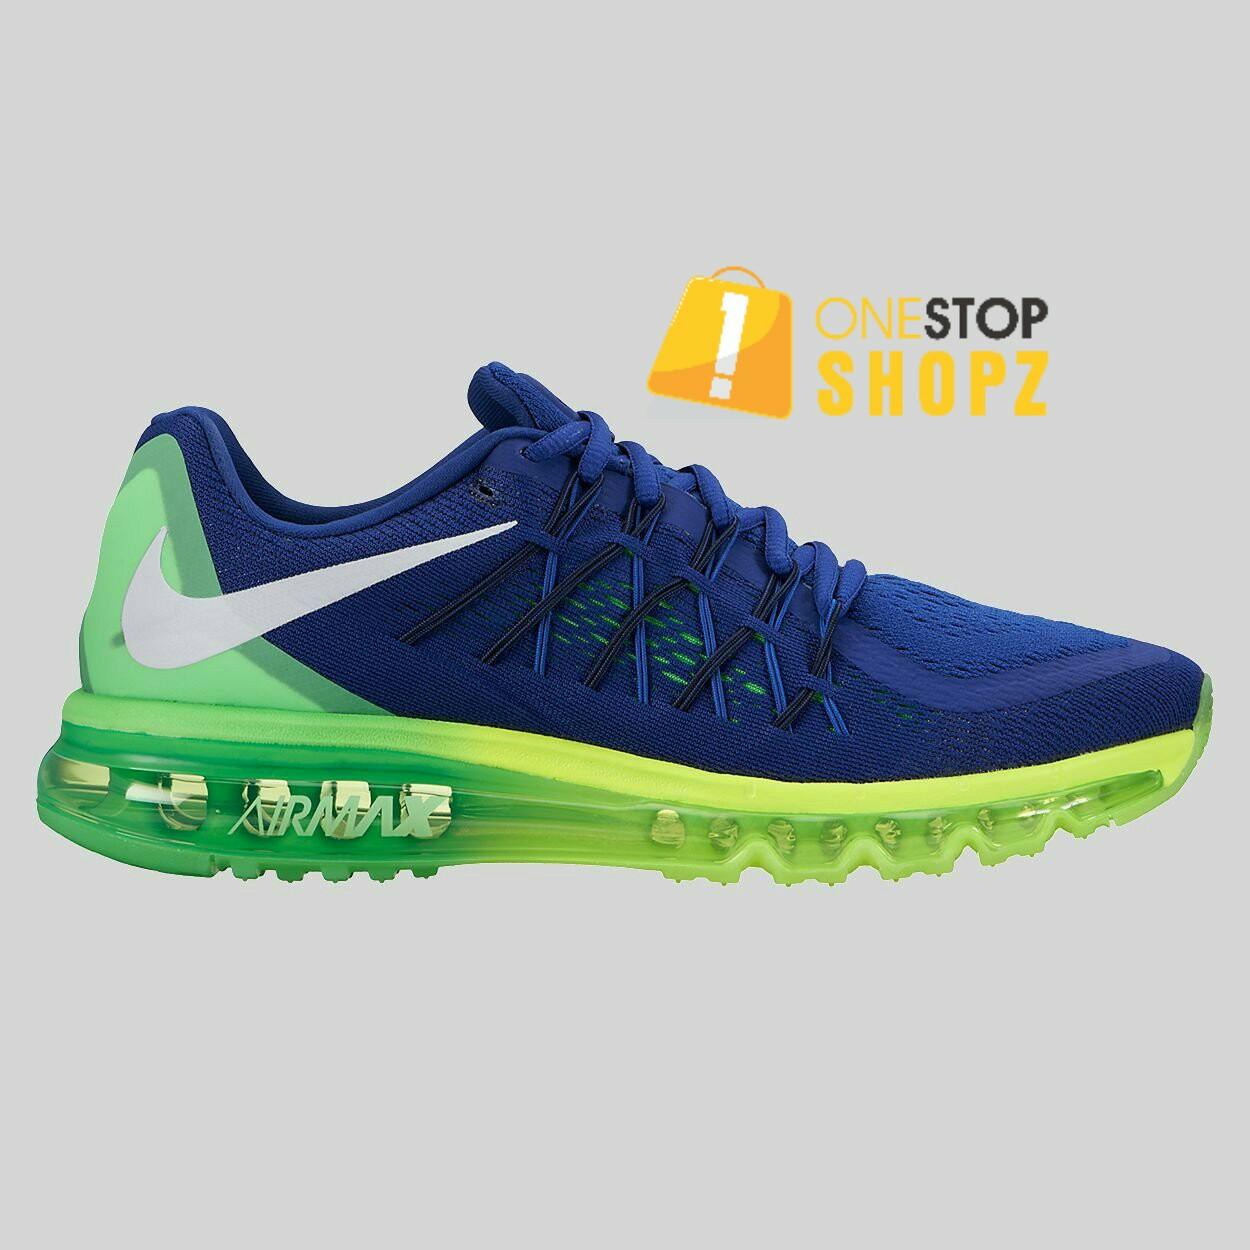 Men's Nike Air Max 90 Essential Sneakers In BlackCrimson Size 8 ( 537384 036 )